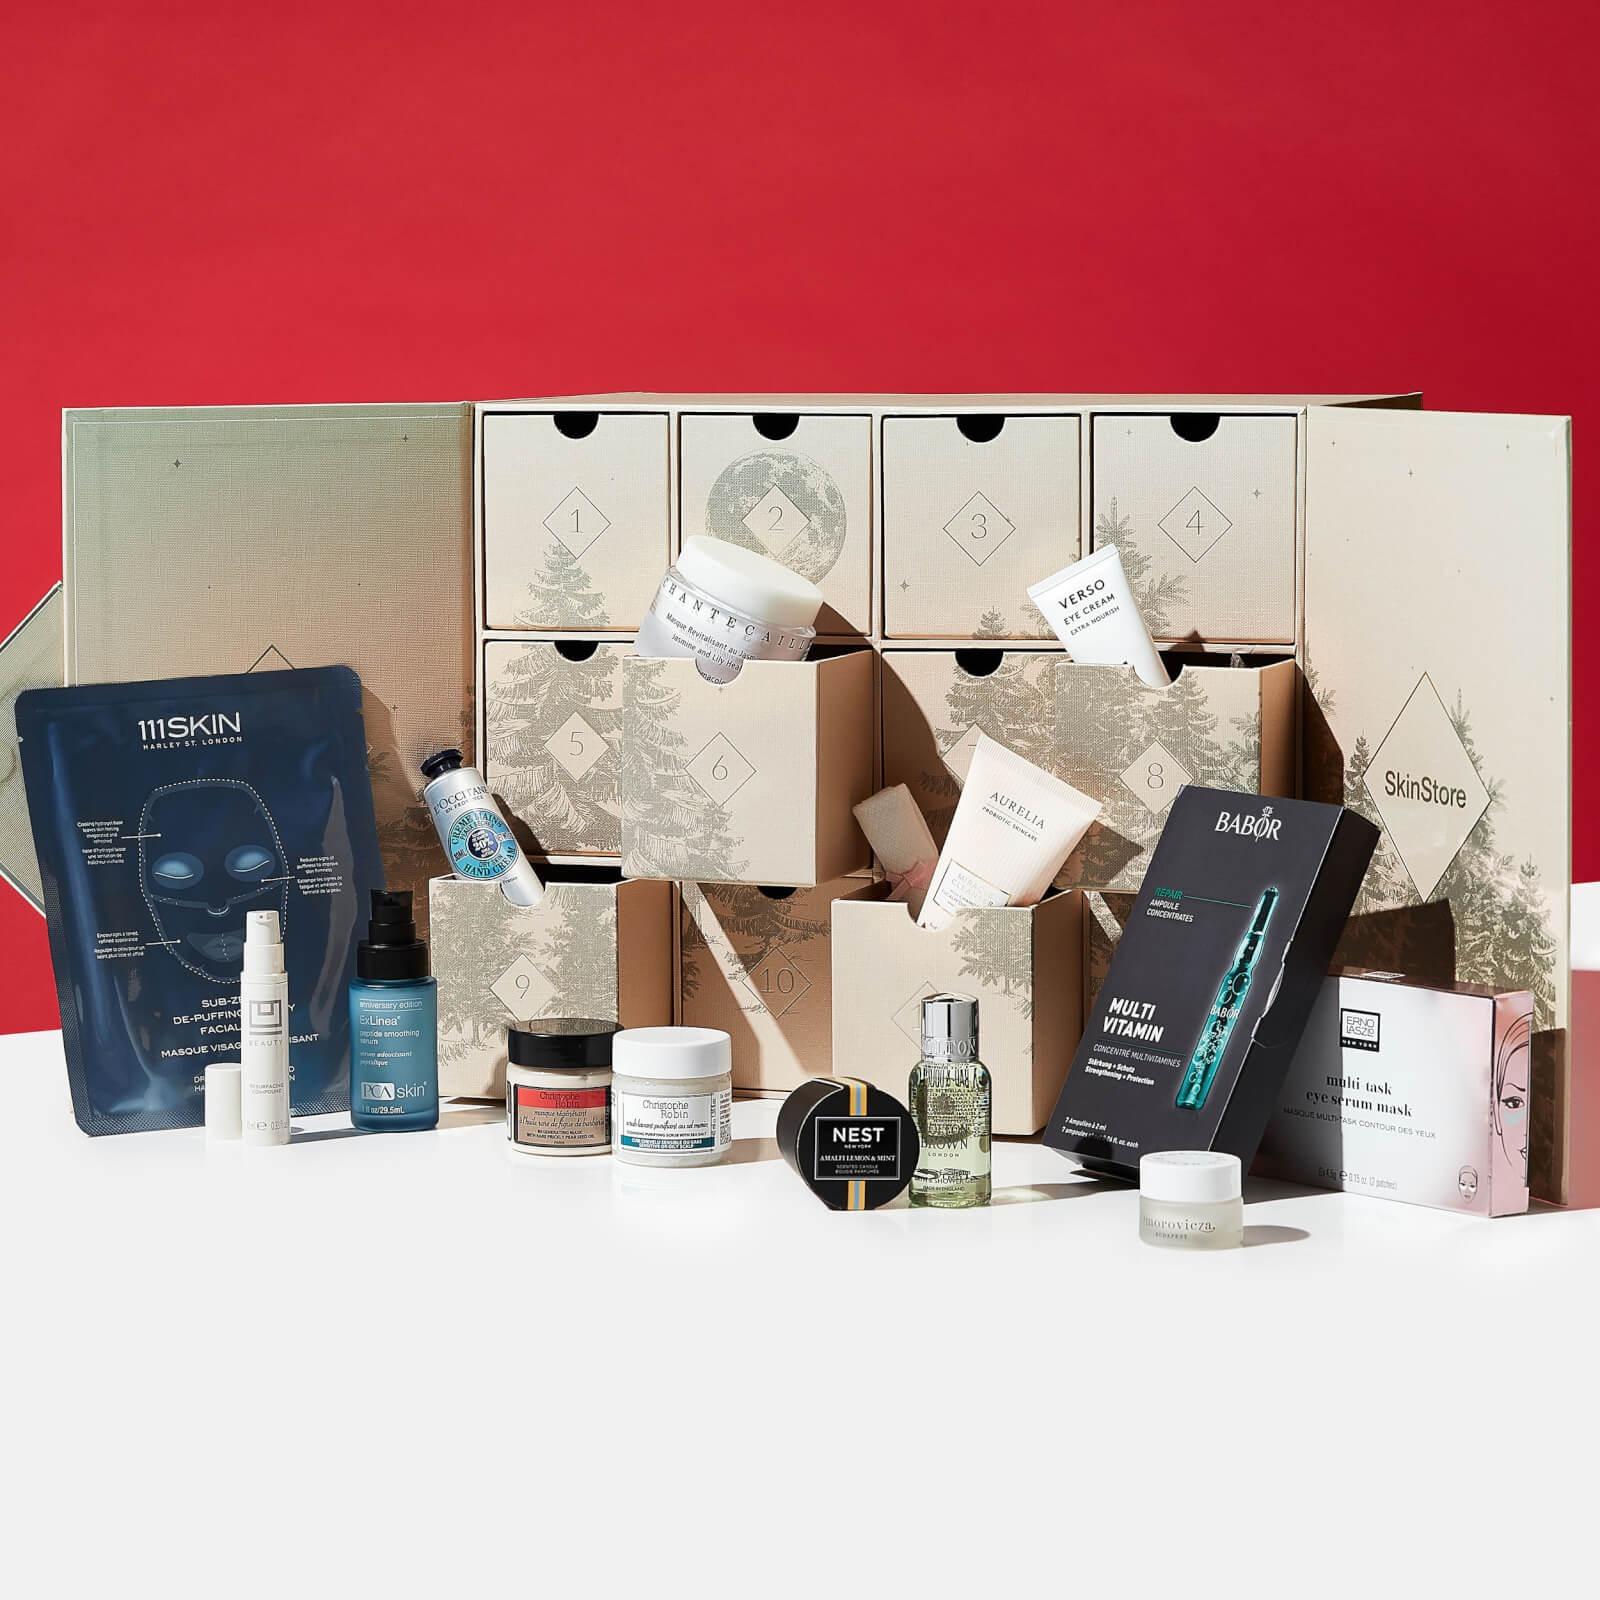 Skinstore 超值限量假期美妆礼盒